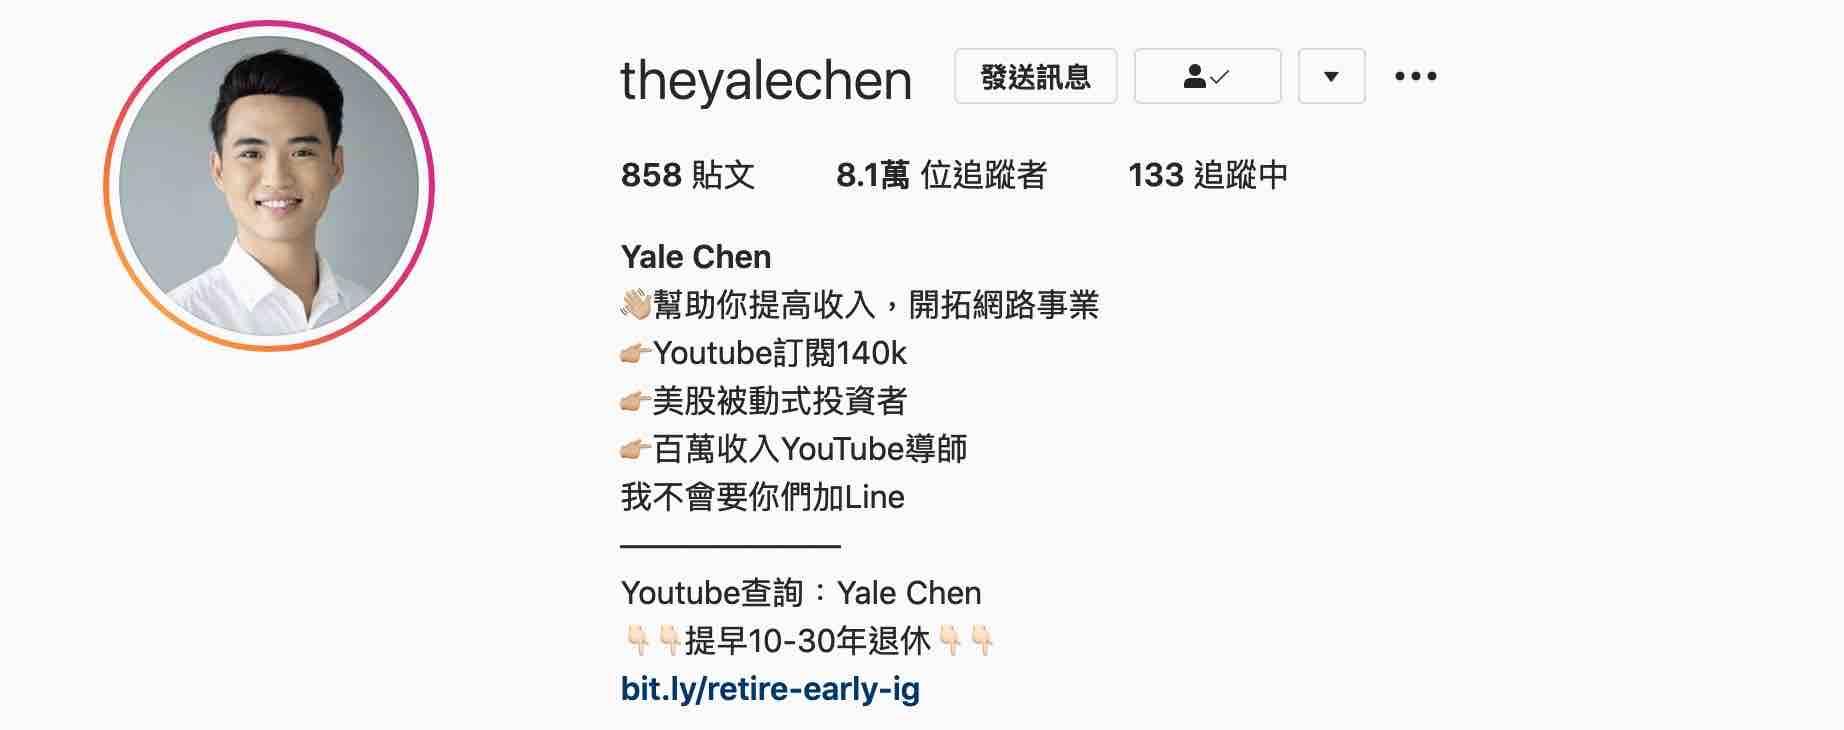 yale-chen-instagram